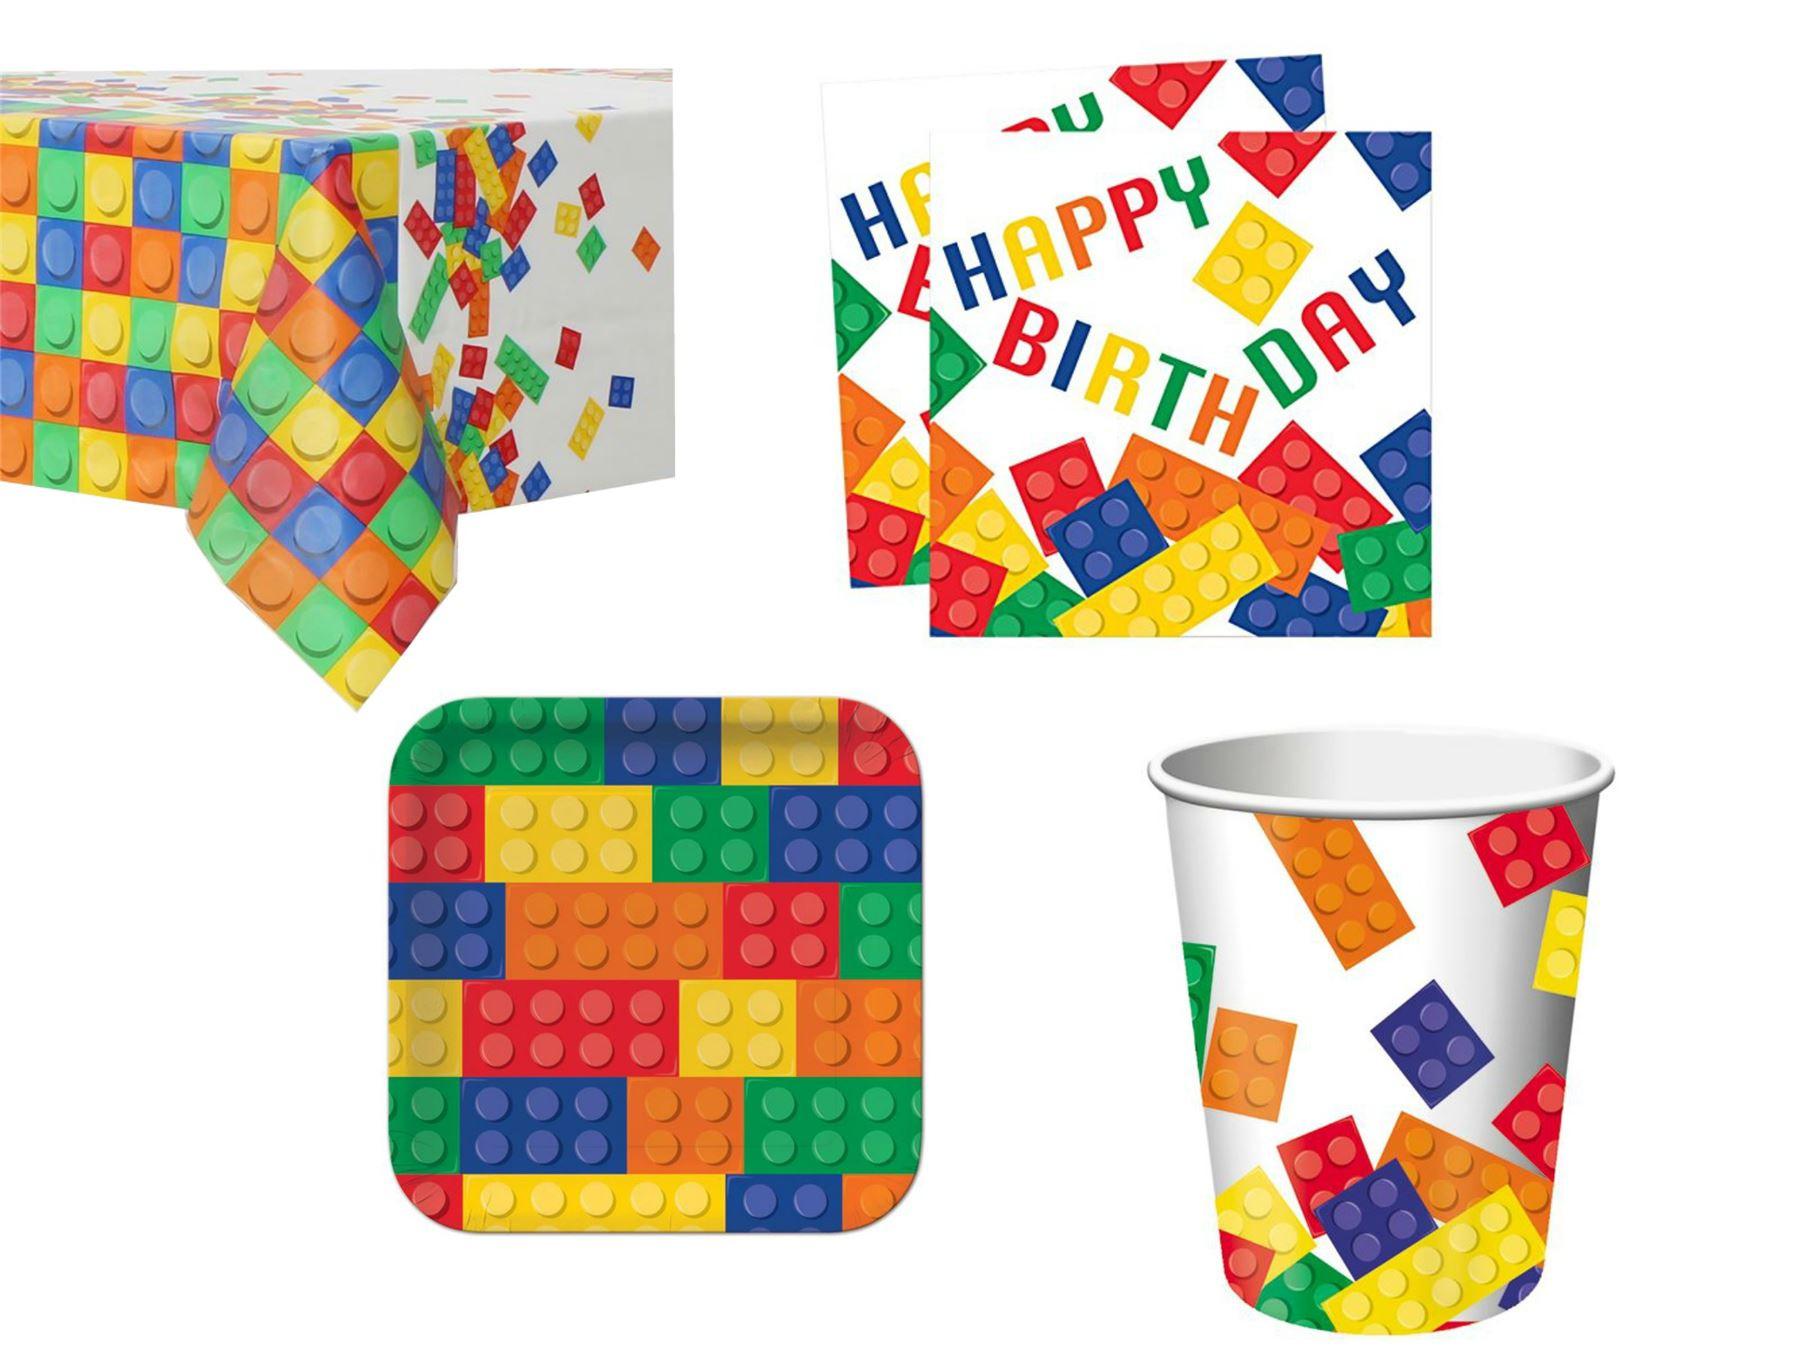 Lego Birthday Party Kit  Block Party Lego Tableware Birthday Party Kit Supplies 8